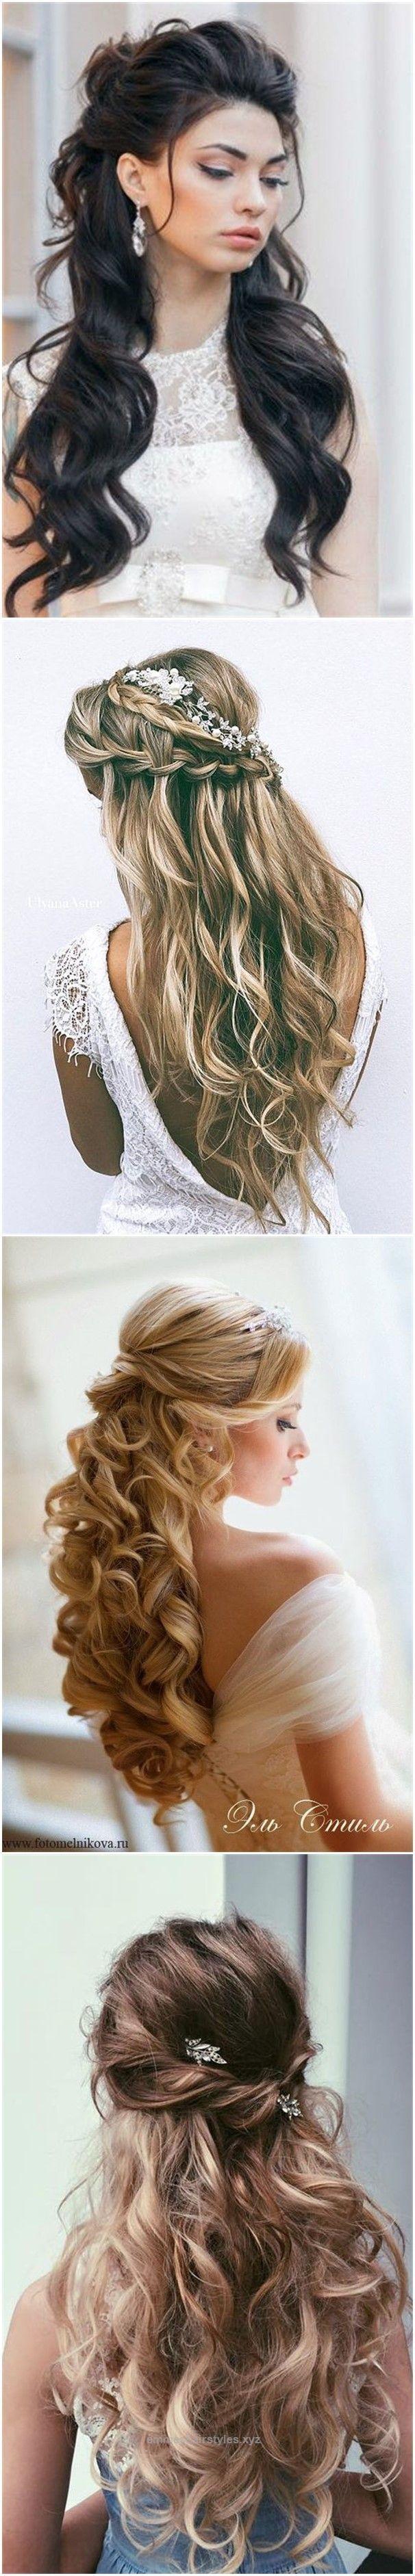 2600 best Best Wedding Hairstyles images on Pinterest